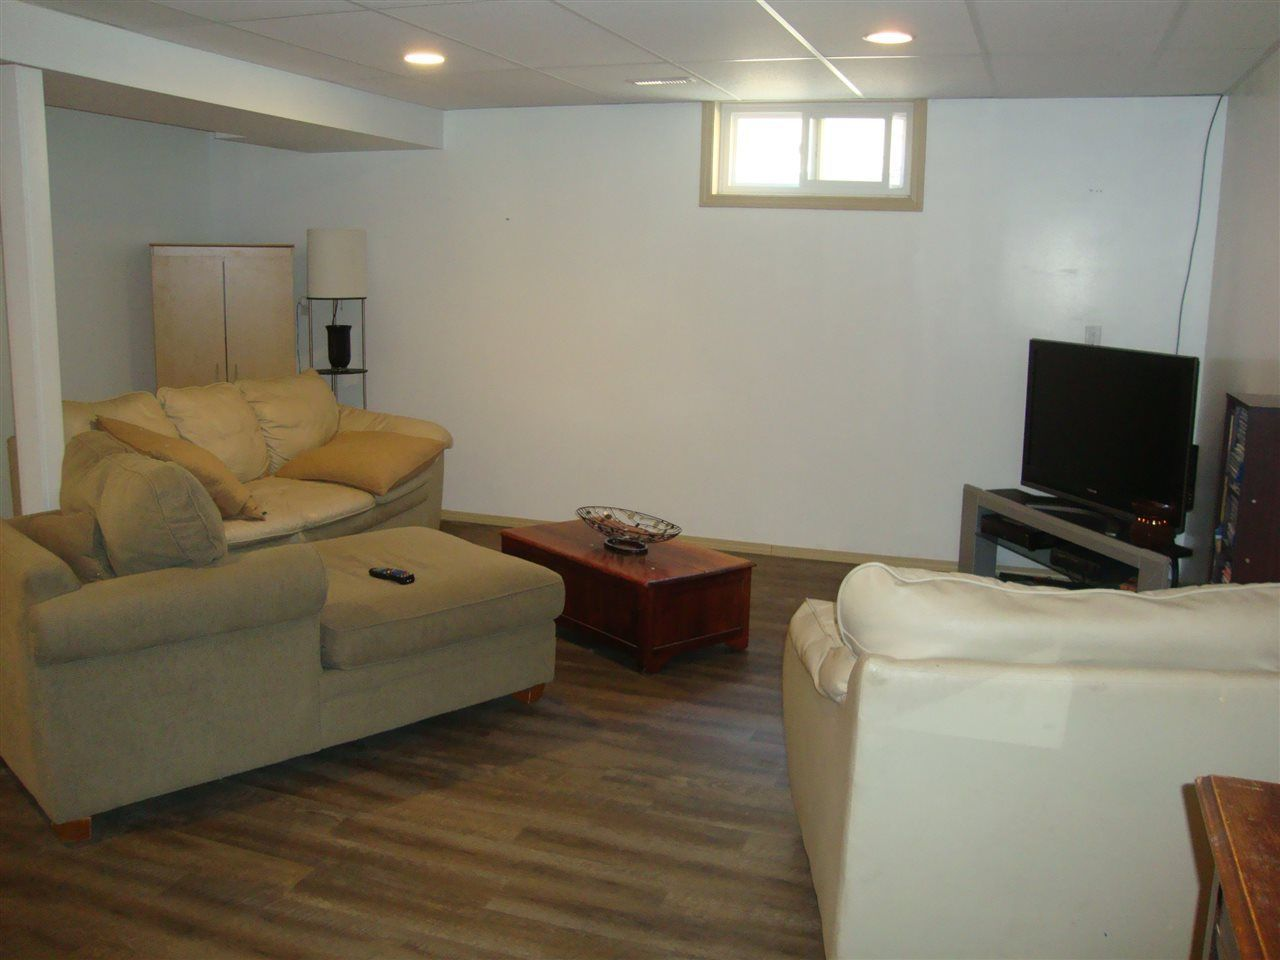 Photo 23: Photos: 4711 51A Avenue: Bon Accord House for sale : MLS®# E4149195